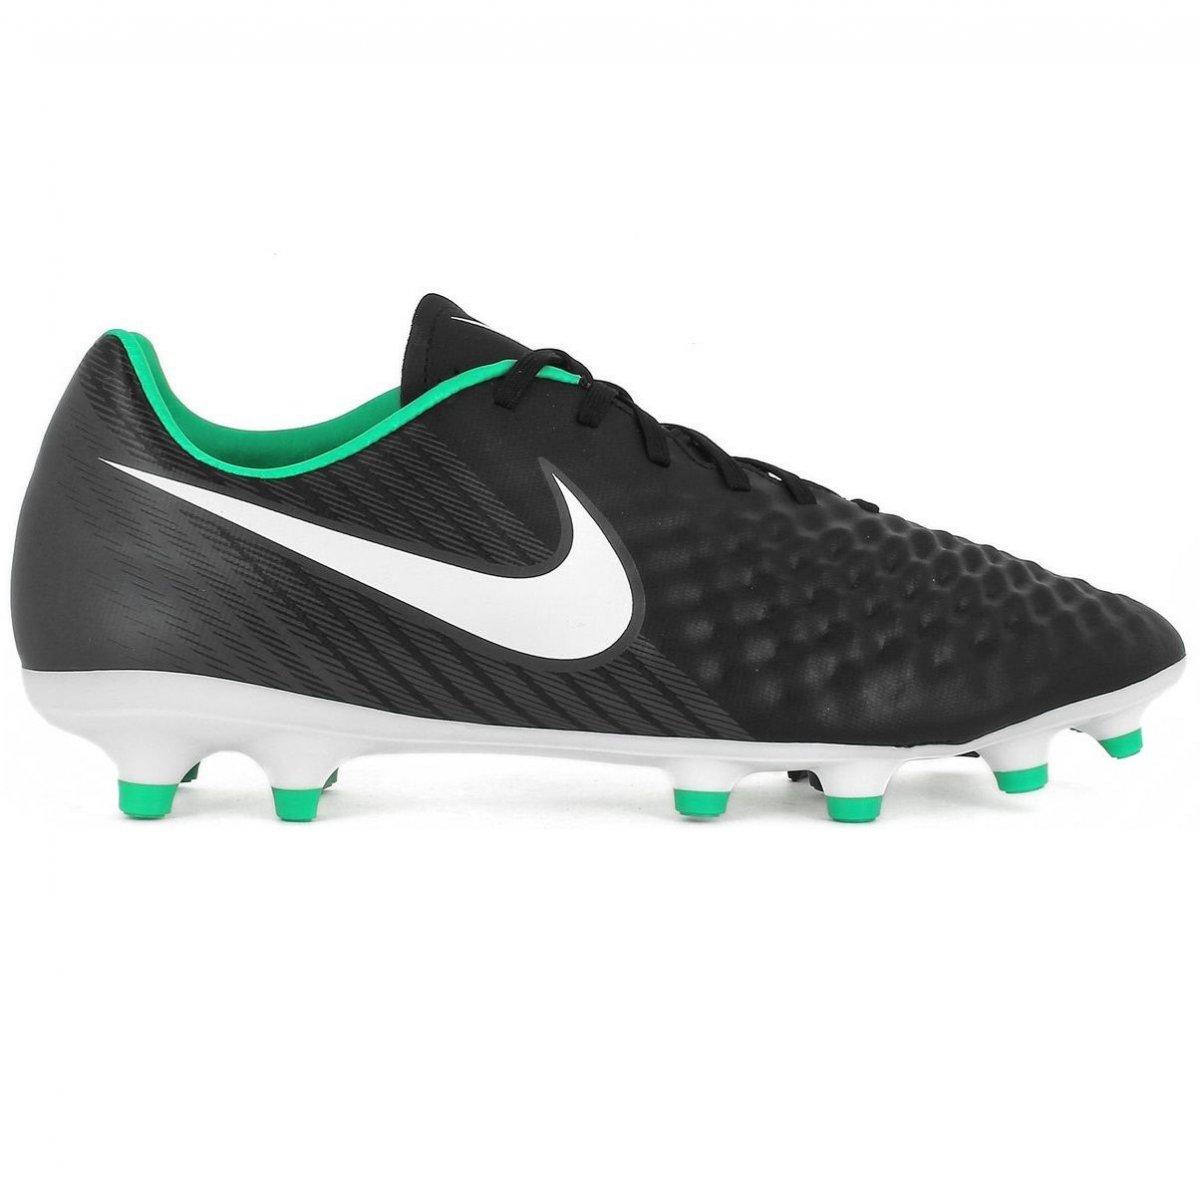 e4adbb6944 Bizz Store - Chuteira Futebol de Campo Nike Magista Onda II FG